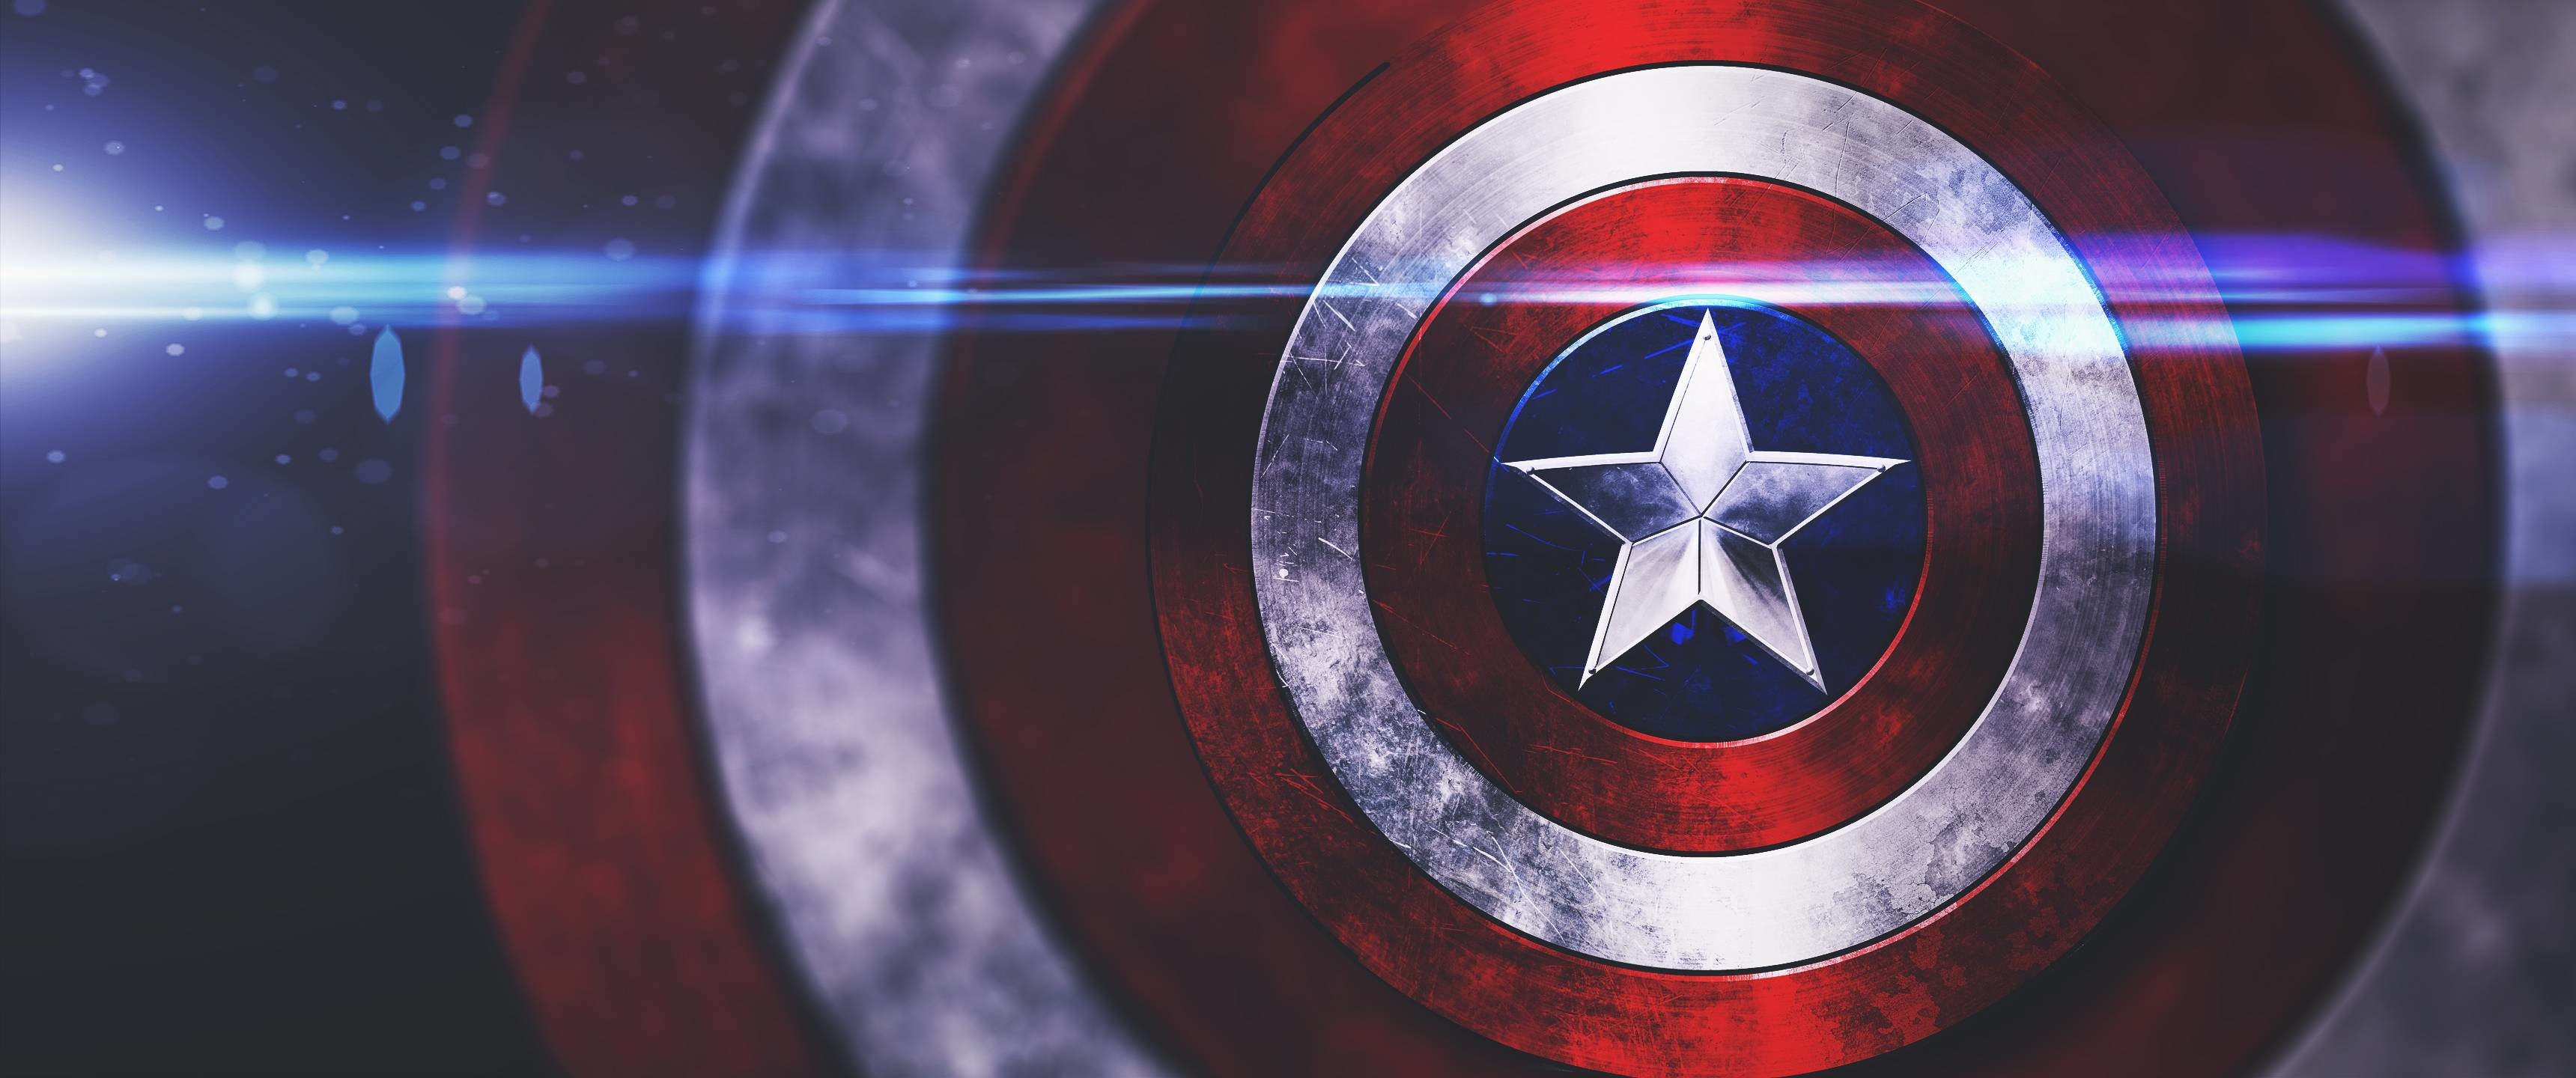 Captain America shield wallpaper I made in PS. [3440×1440]